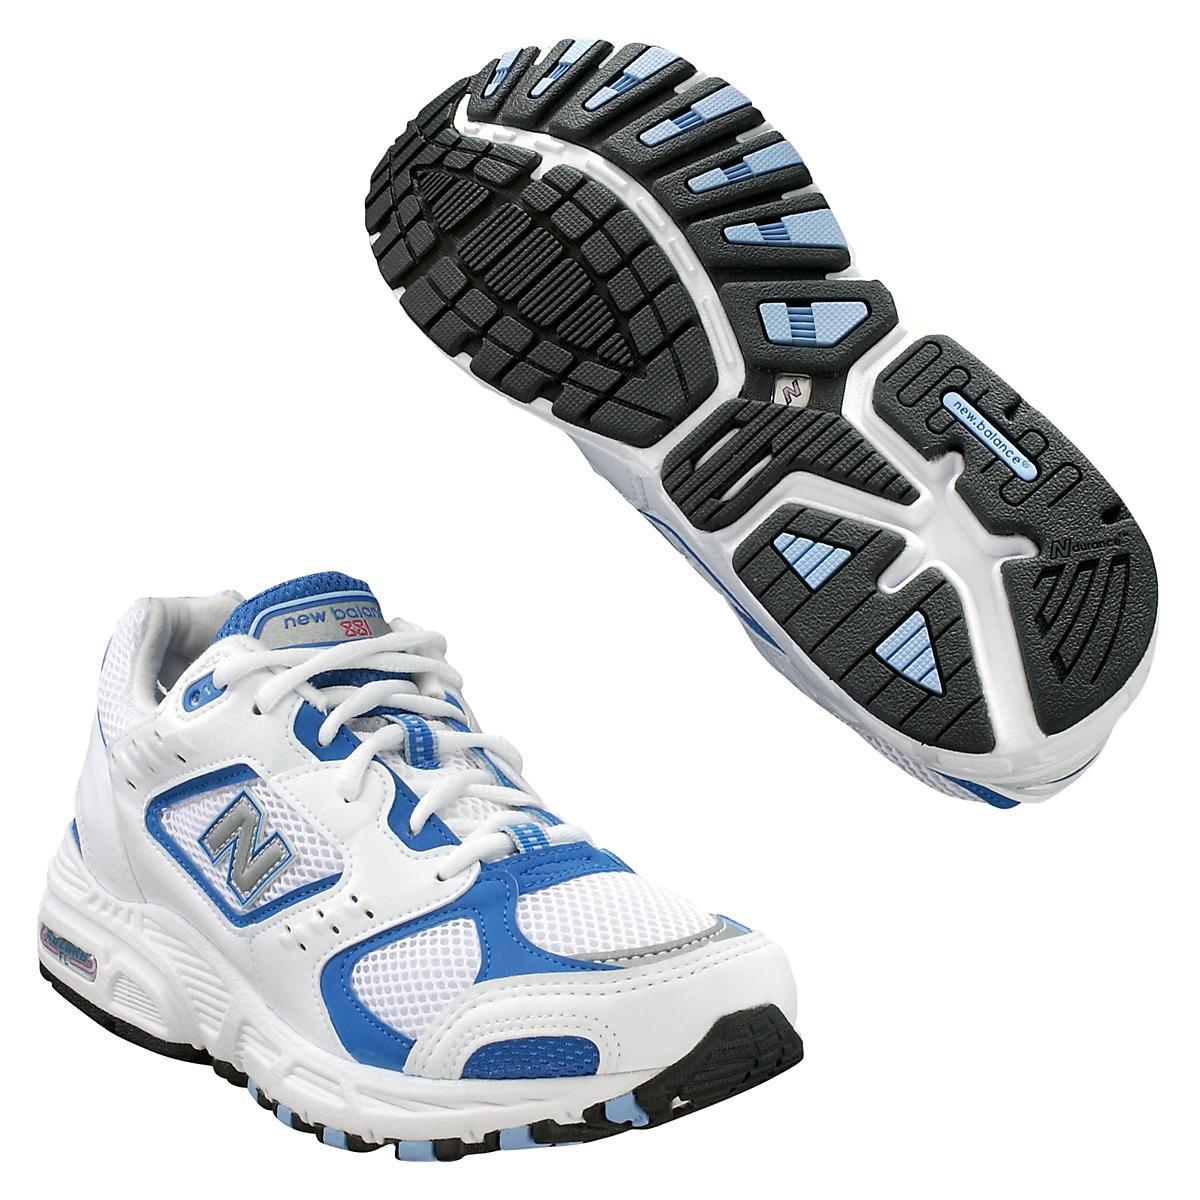 fd46a8ea8f762 Womens New Balance 881 Running Shoe at Road Runner Sports